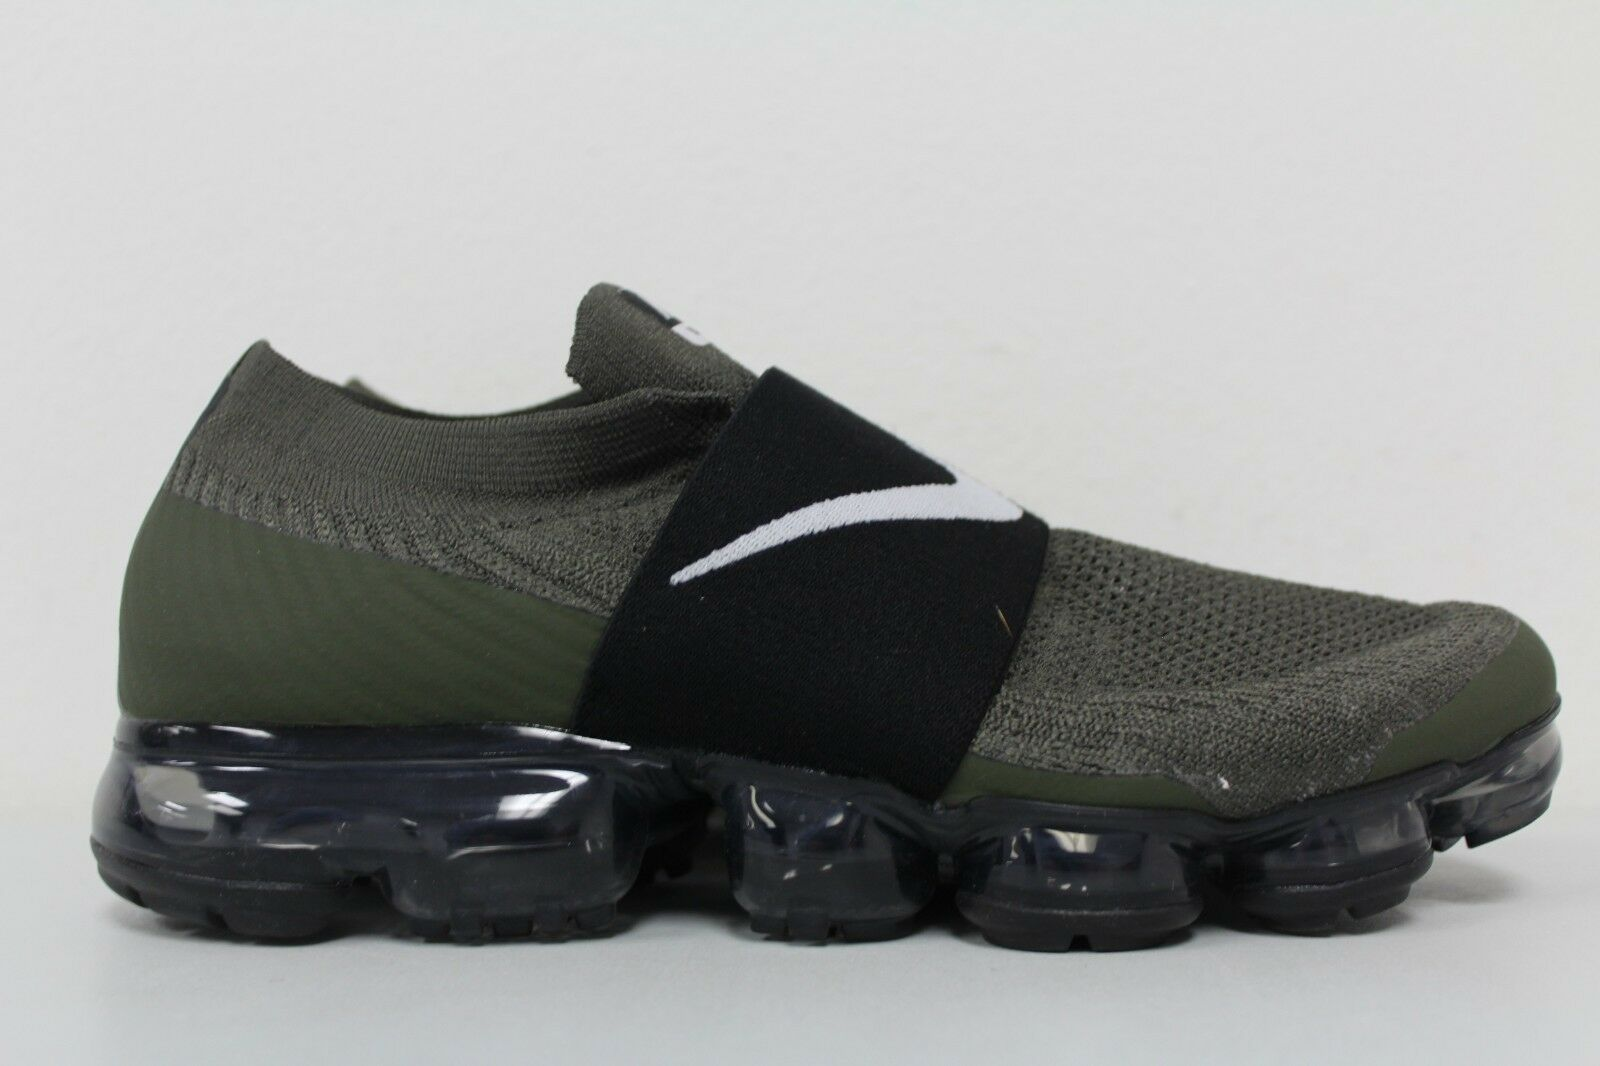 baf98ab7c3c1f Nike Womens Air Vapormax Flyknit MOC Cargo Khaki Black Aa4155 300 ...